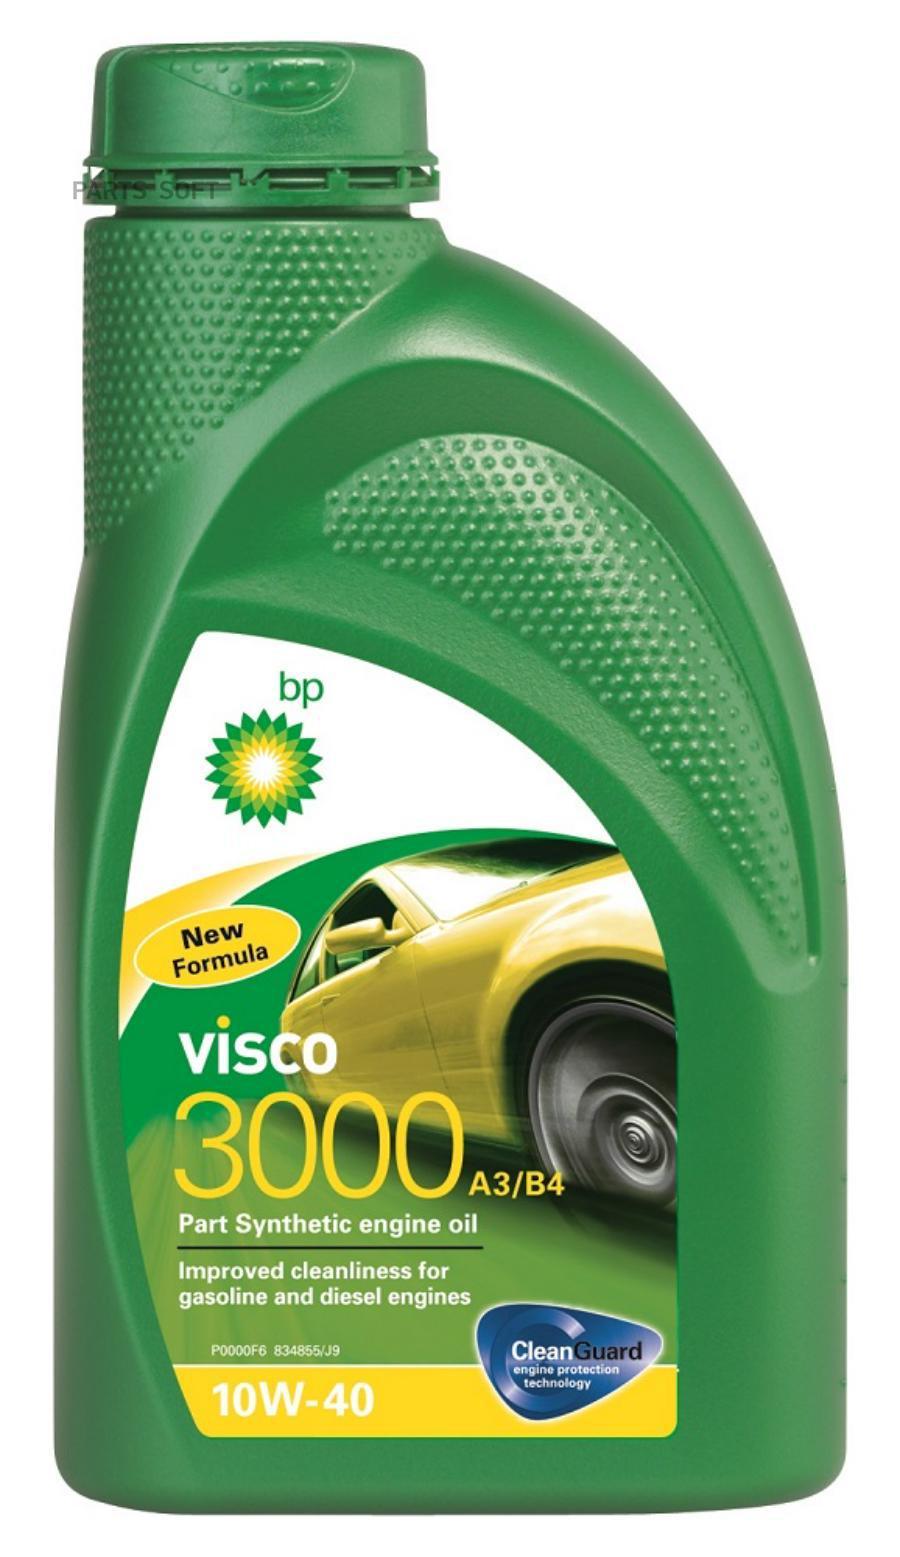 Масло BP Visco 3000 10W40 мот п/с (1л)